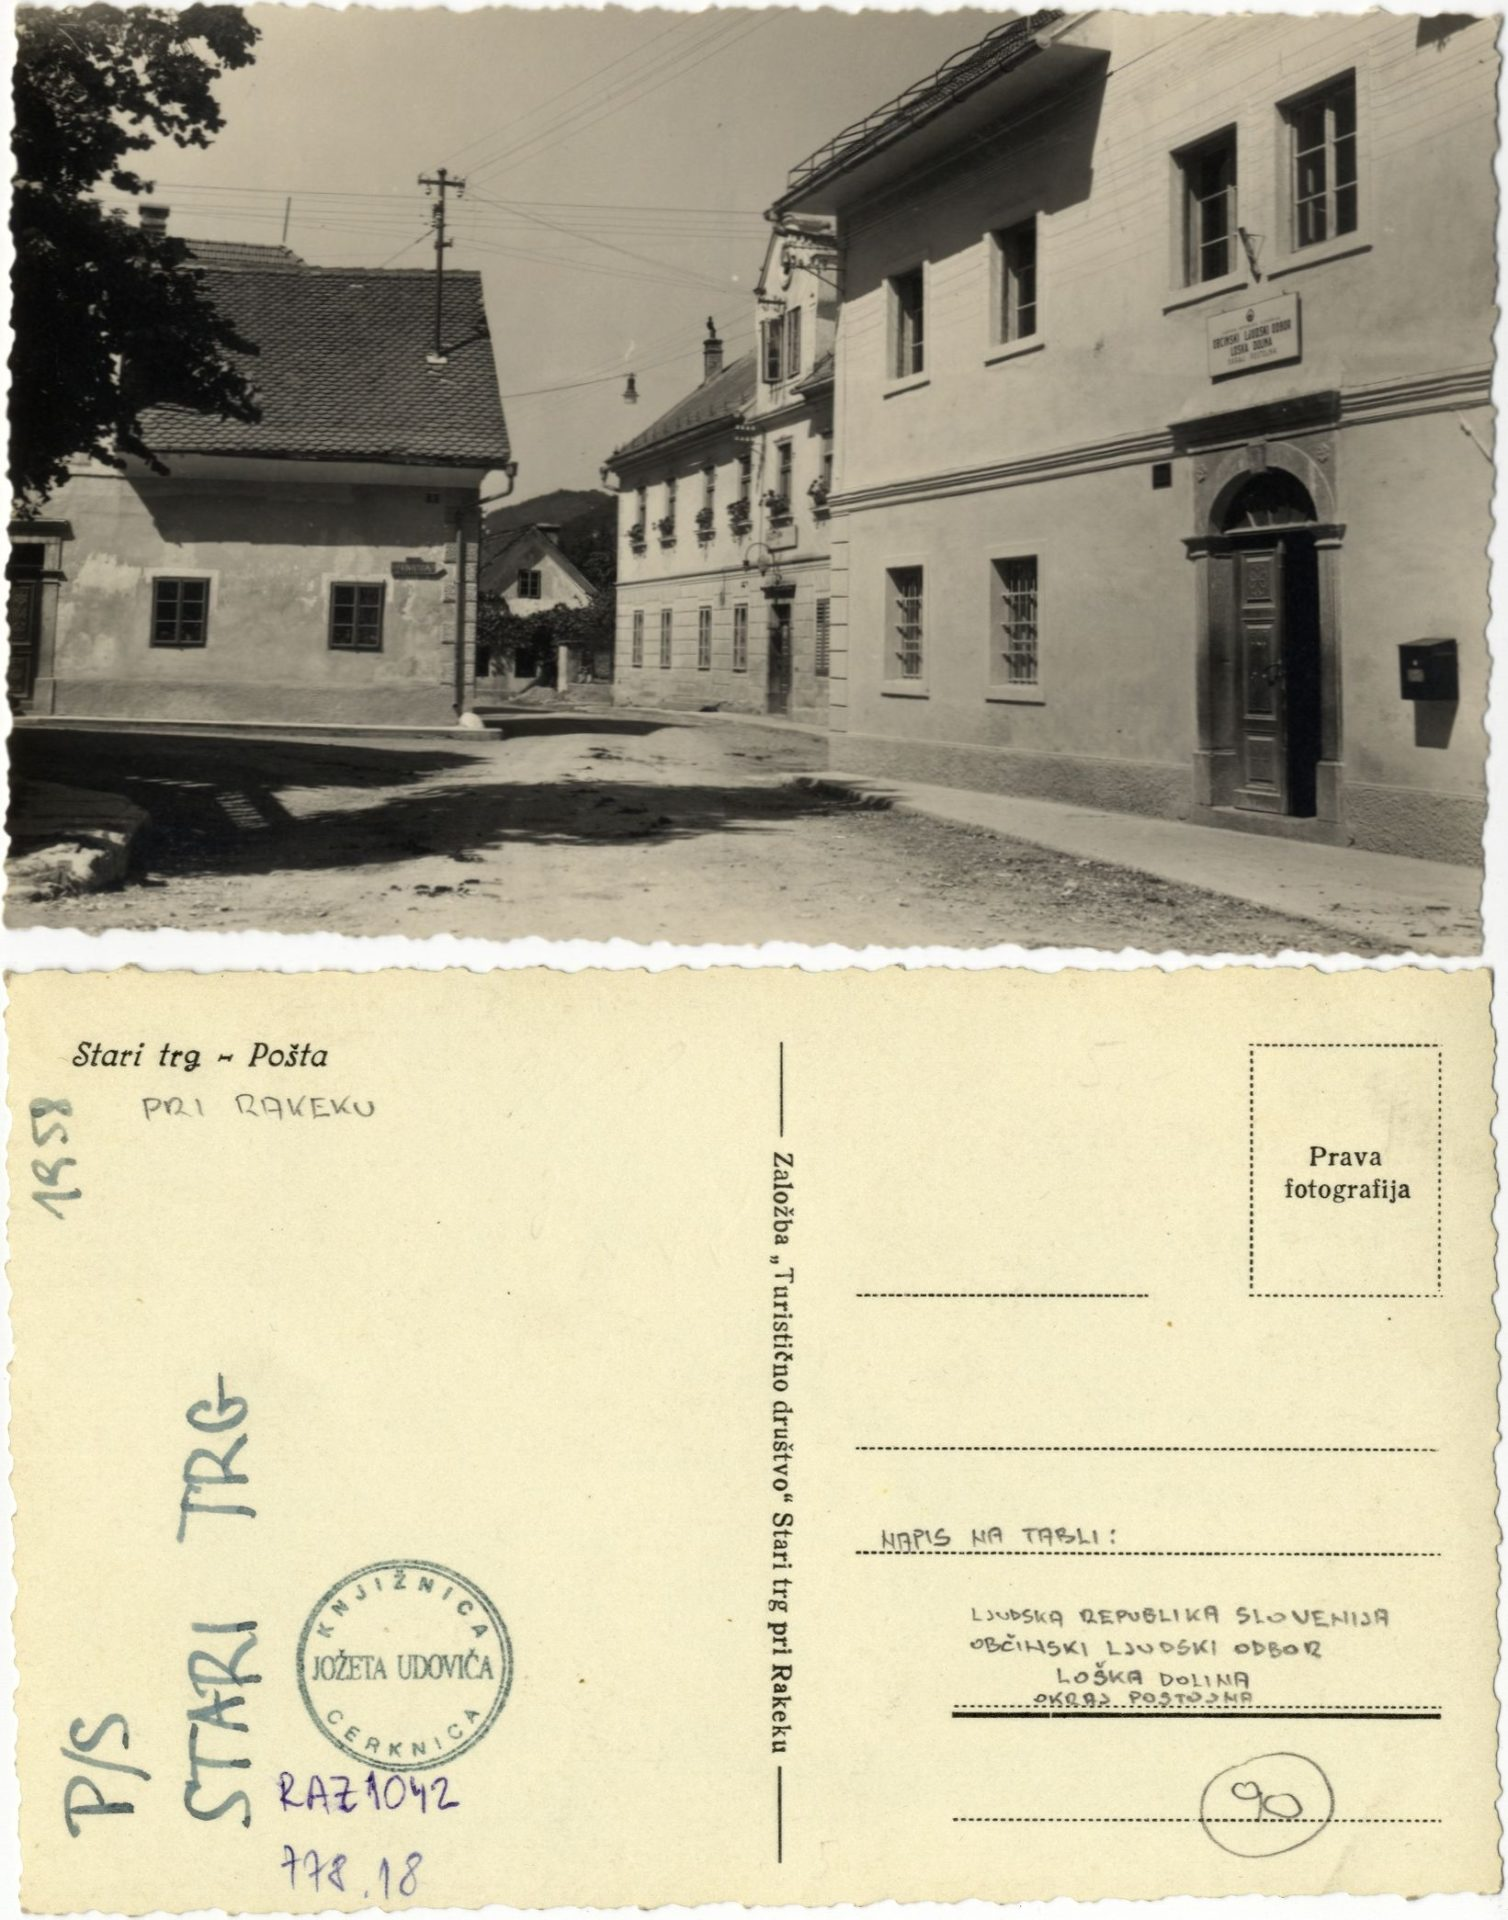 zlimano 159 - Stari trg